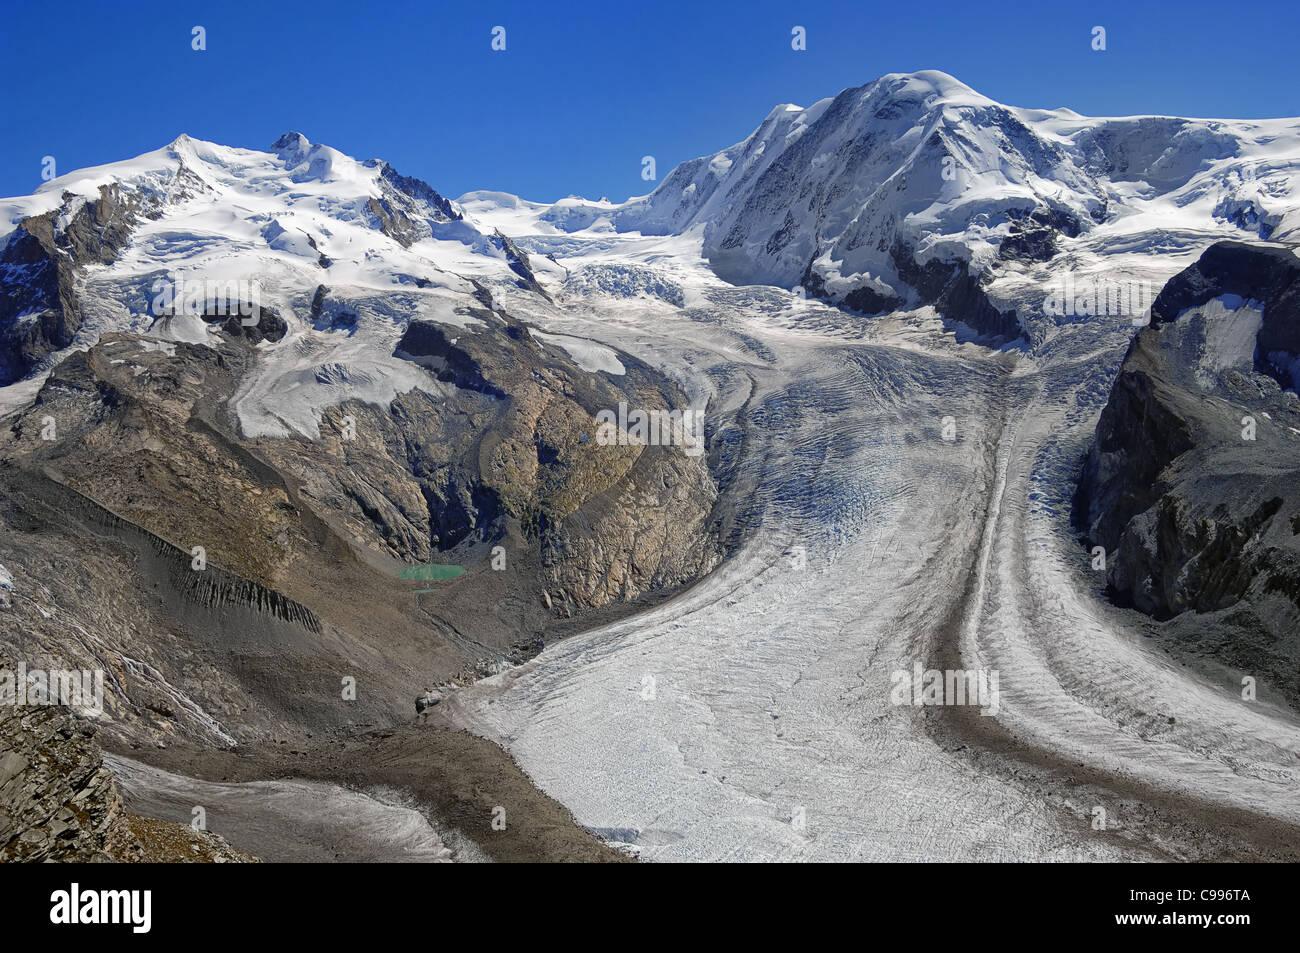 The Grenzgletscher Glacier seen from Gornergrat, the final stop on the mountain railway from Zermatt, Valais canton, - Stock Image